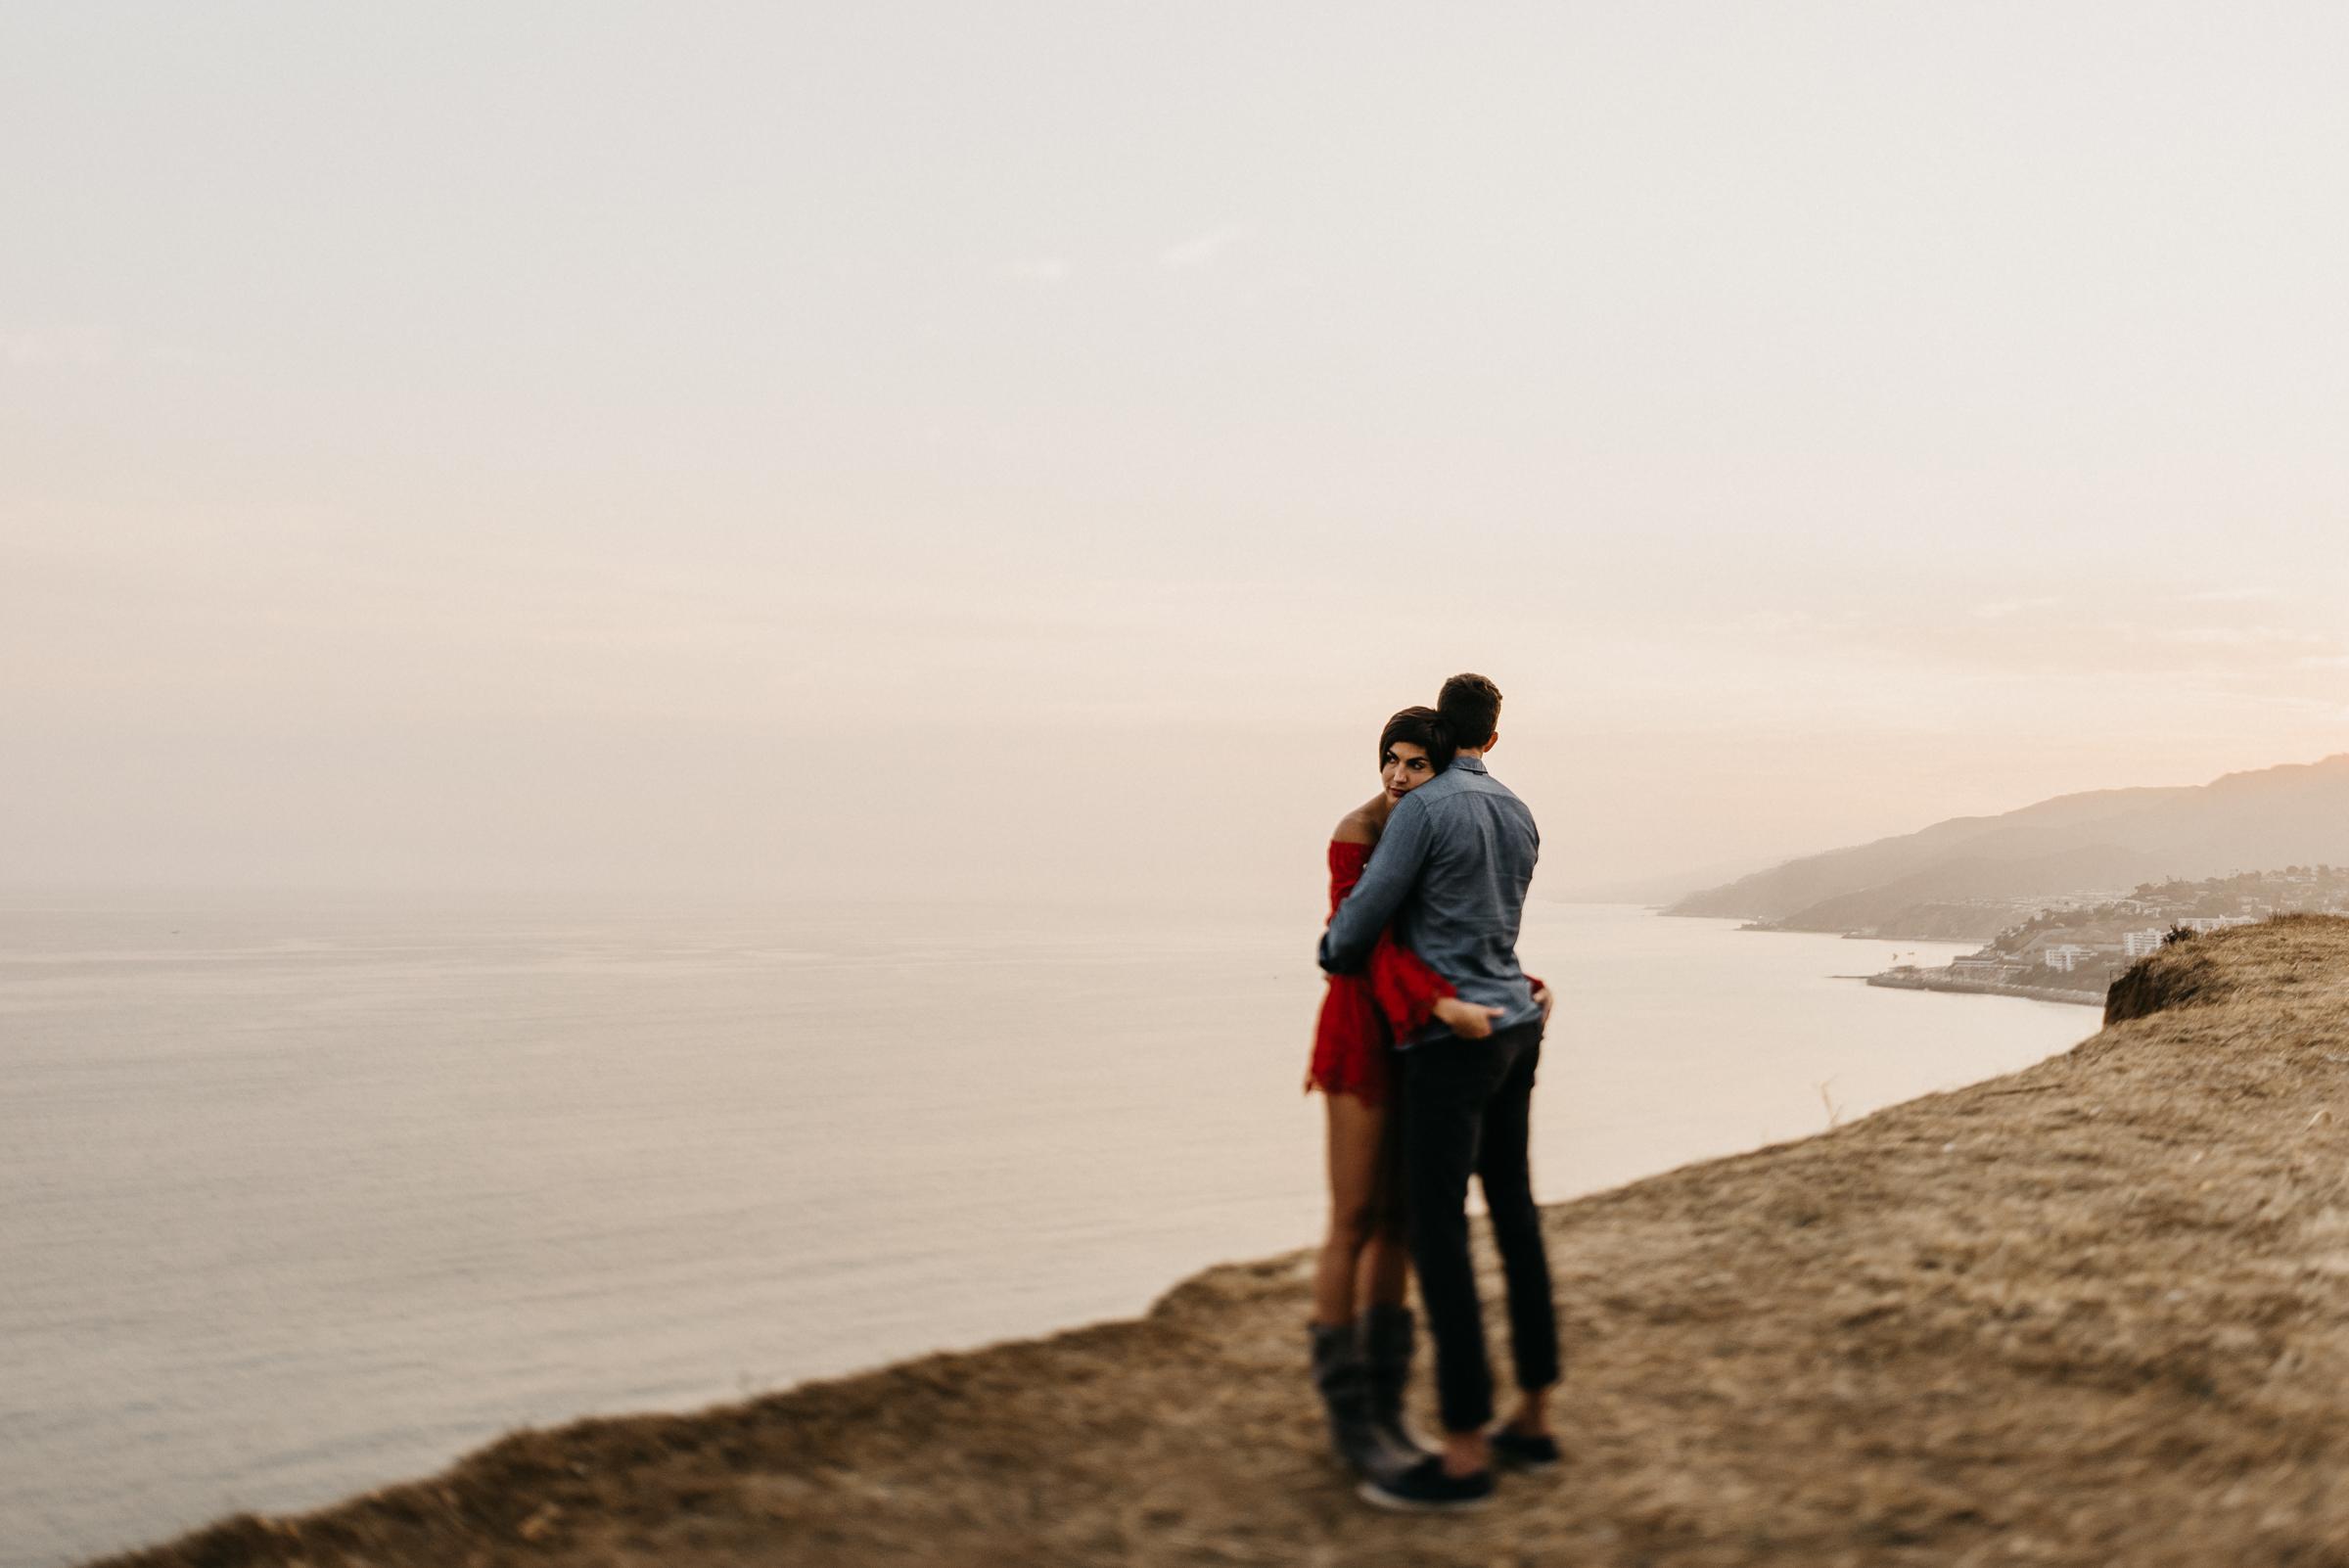 Isaiah + Taylor Photography - Santa Monica Engagement Session, Los Angeles Wedding Photographer-047.jpg